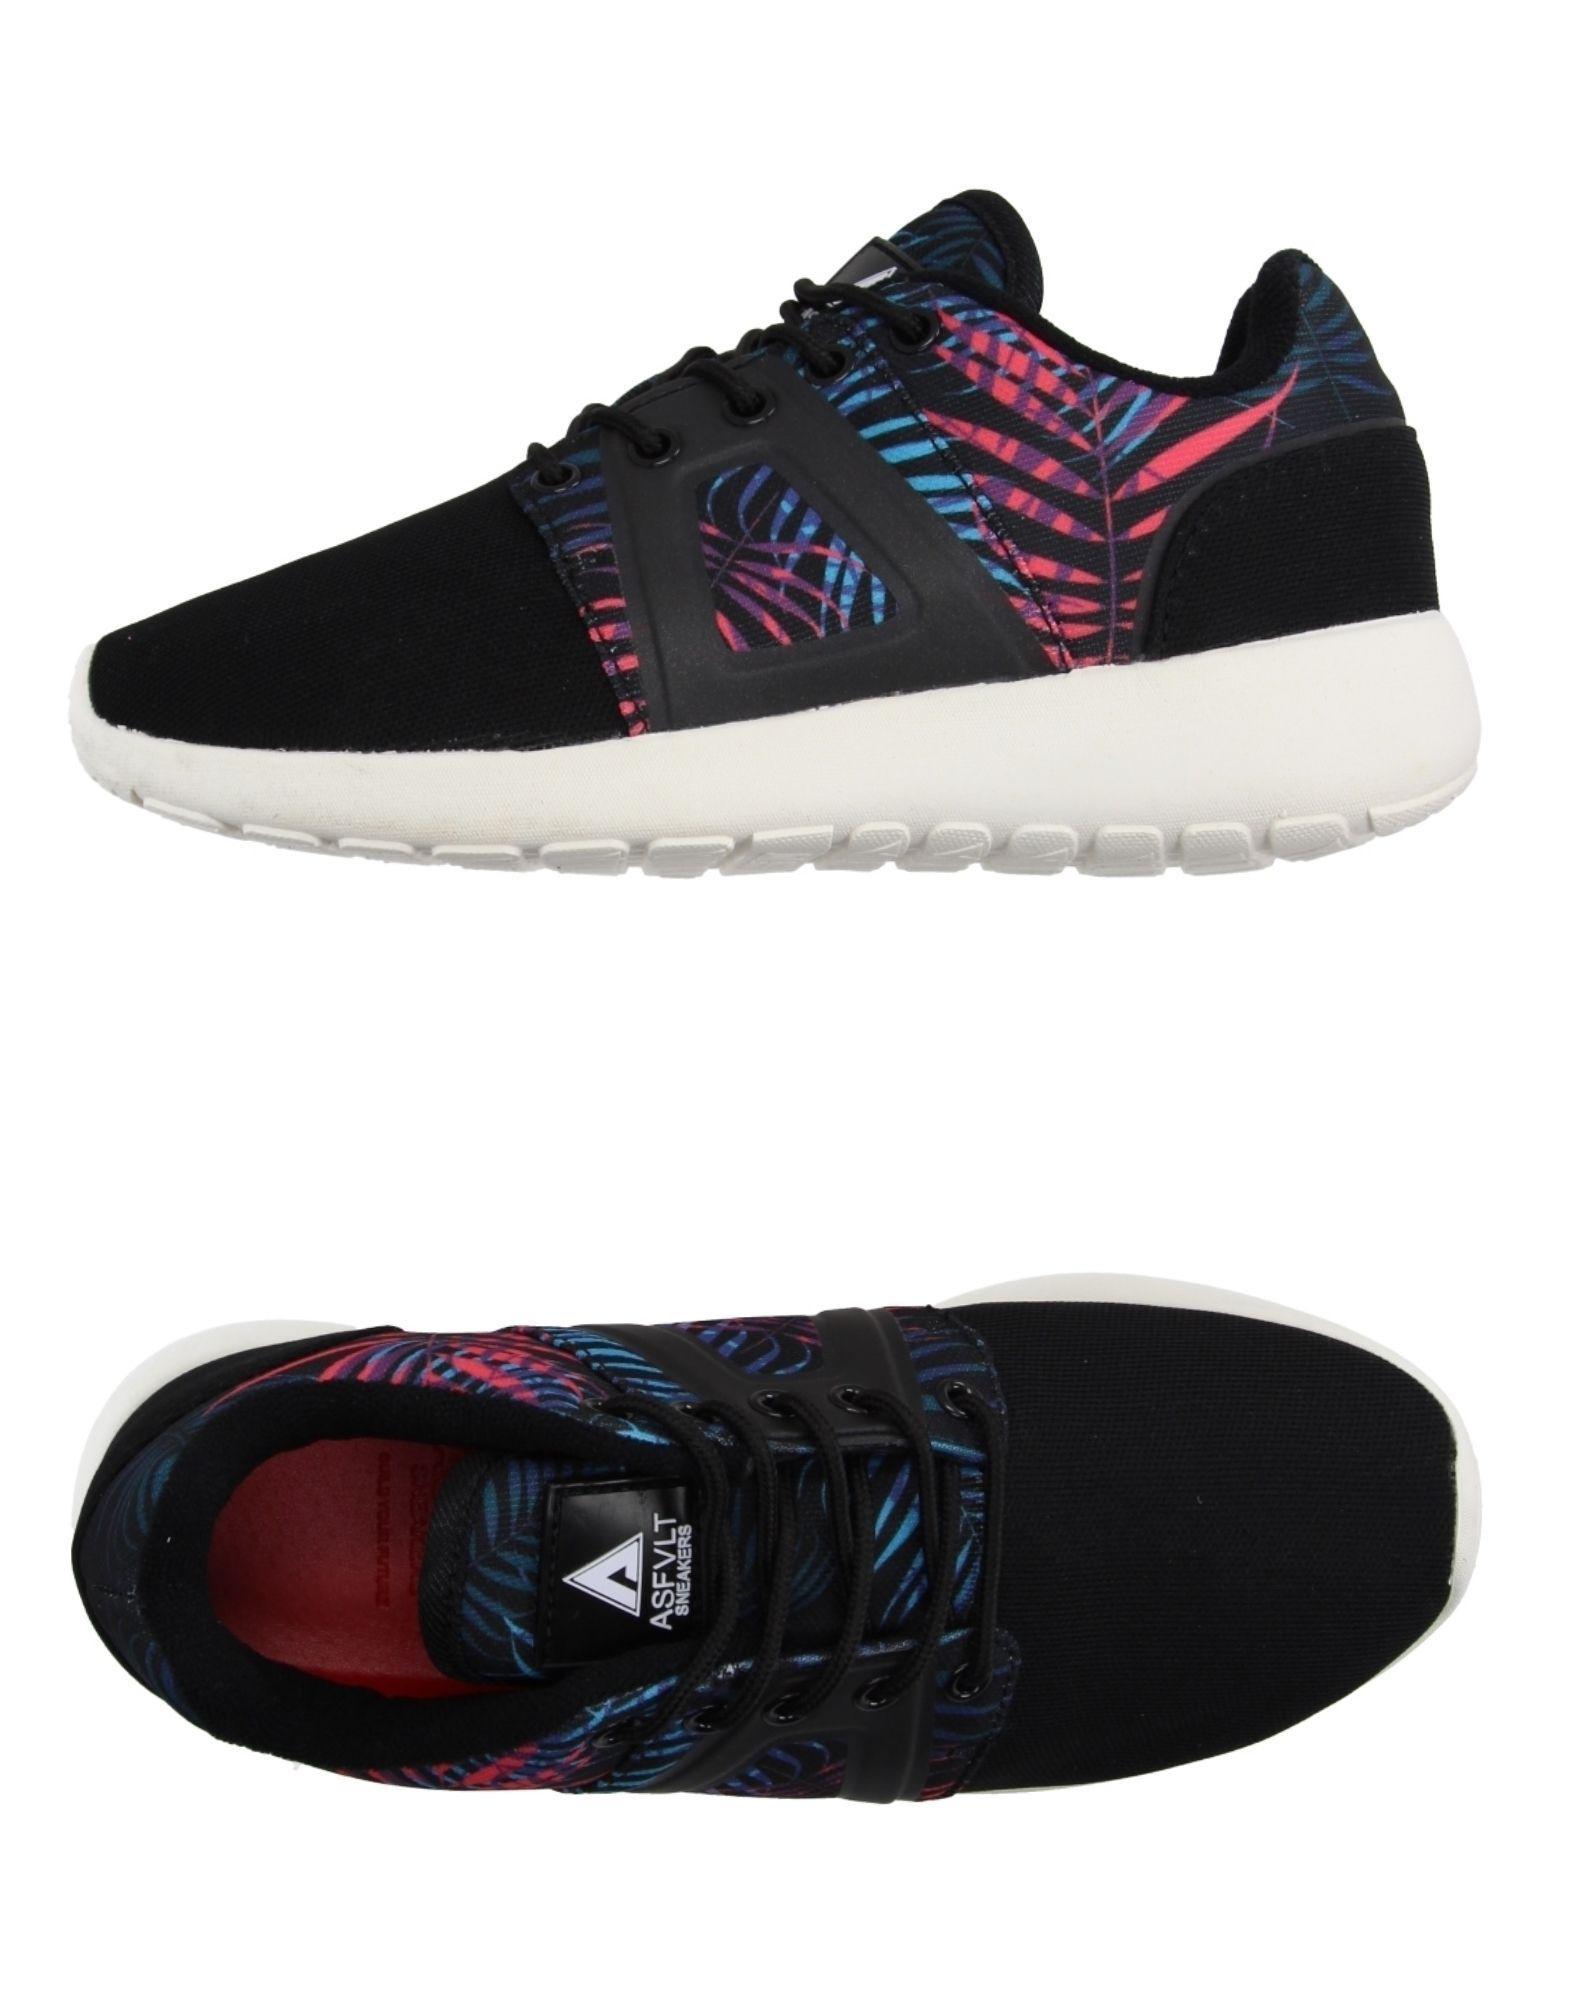 ASFVLT Sneakers Black Men